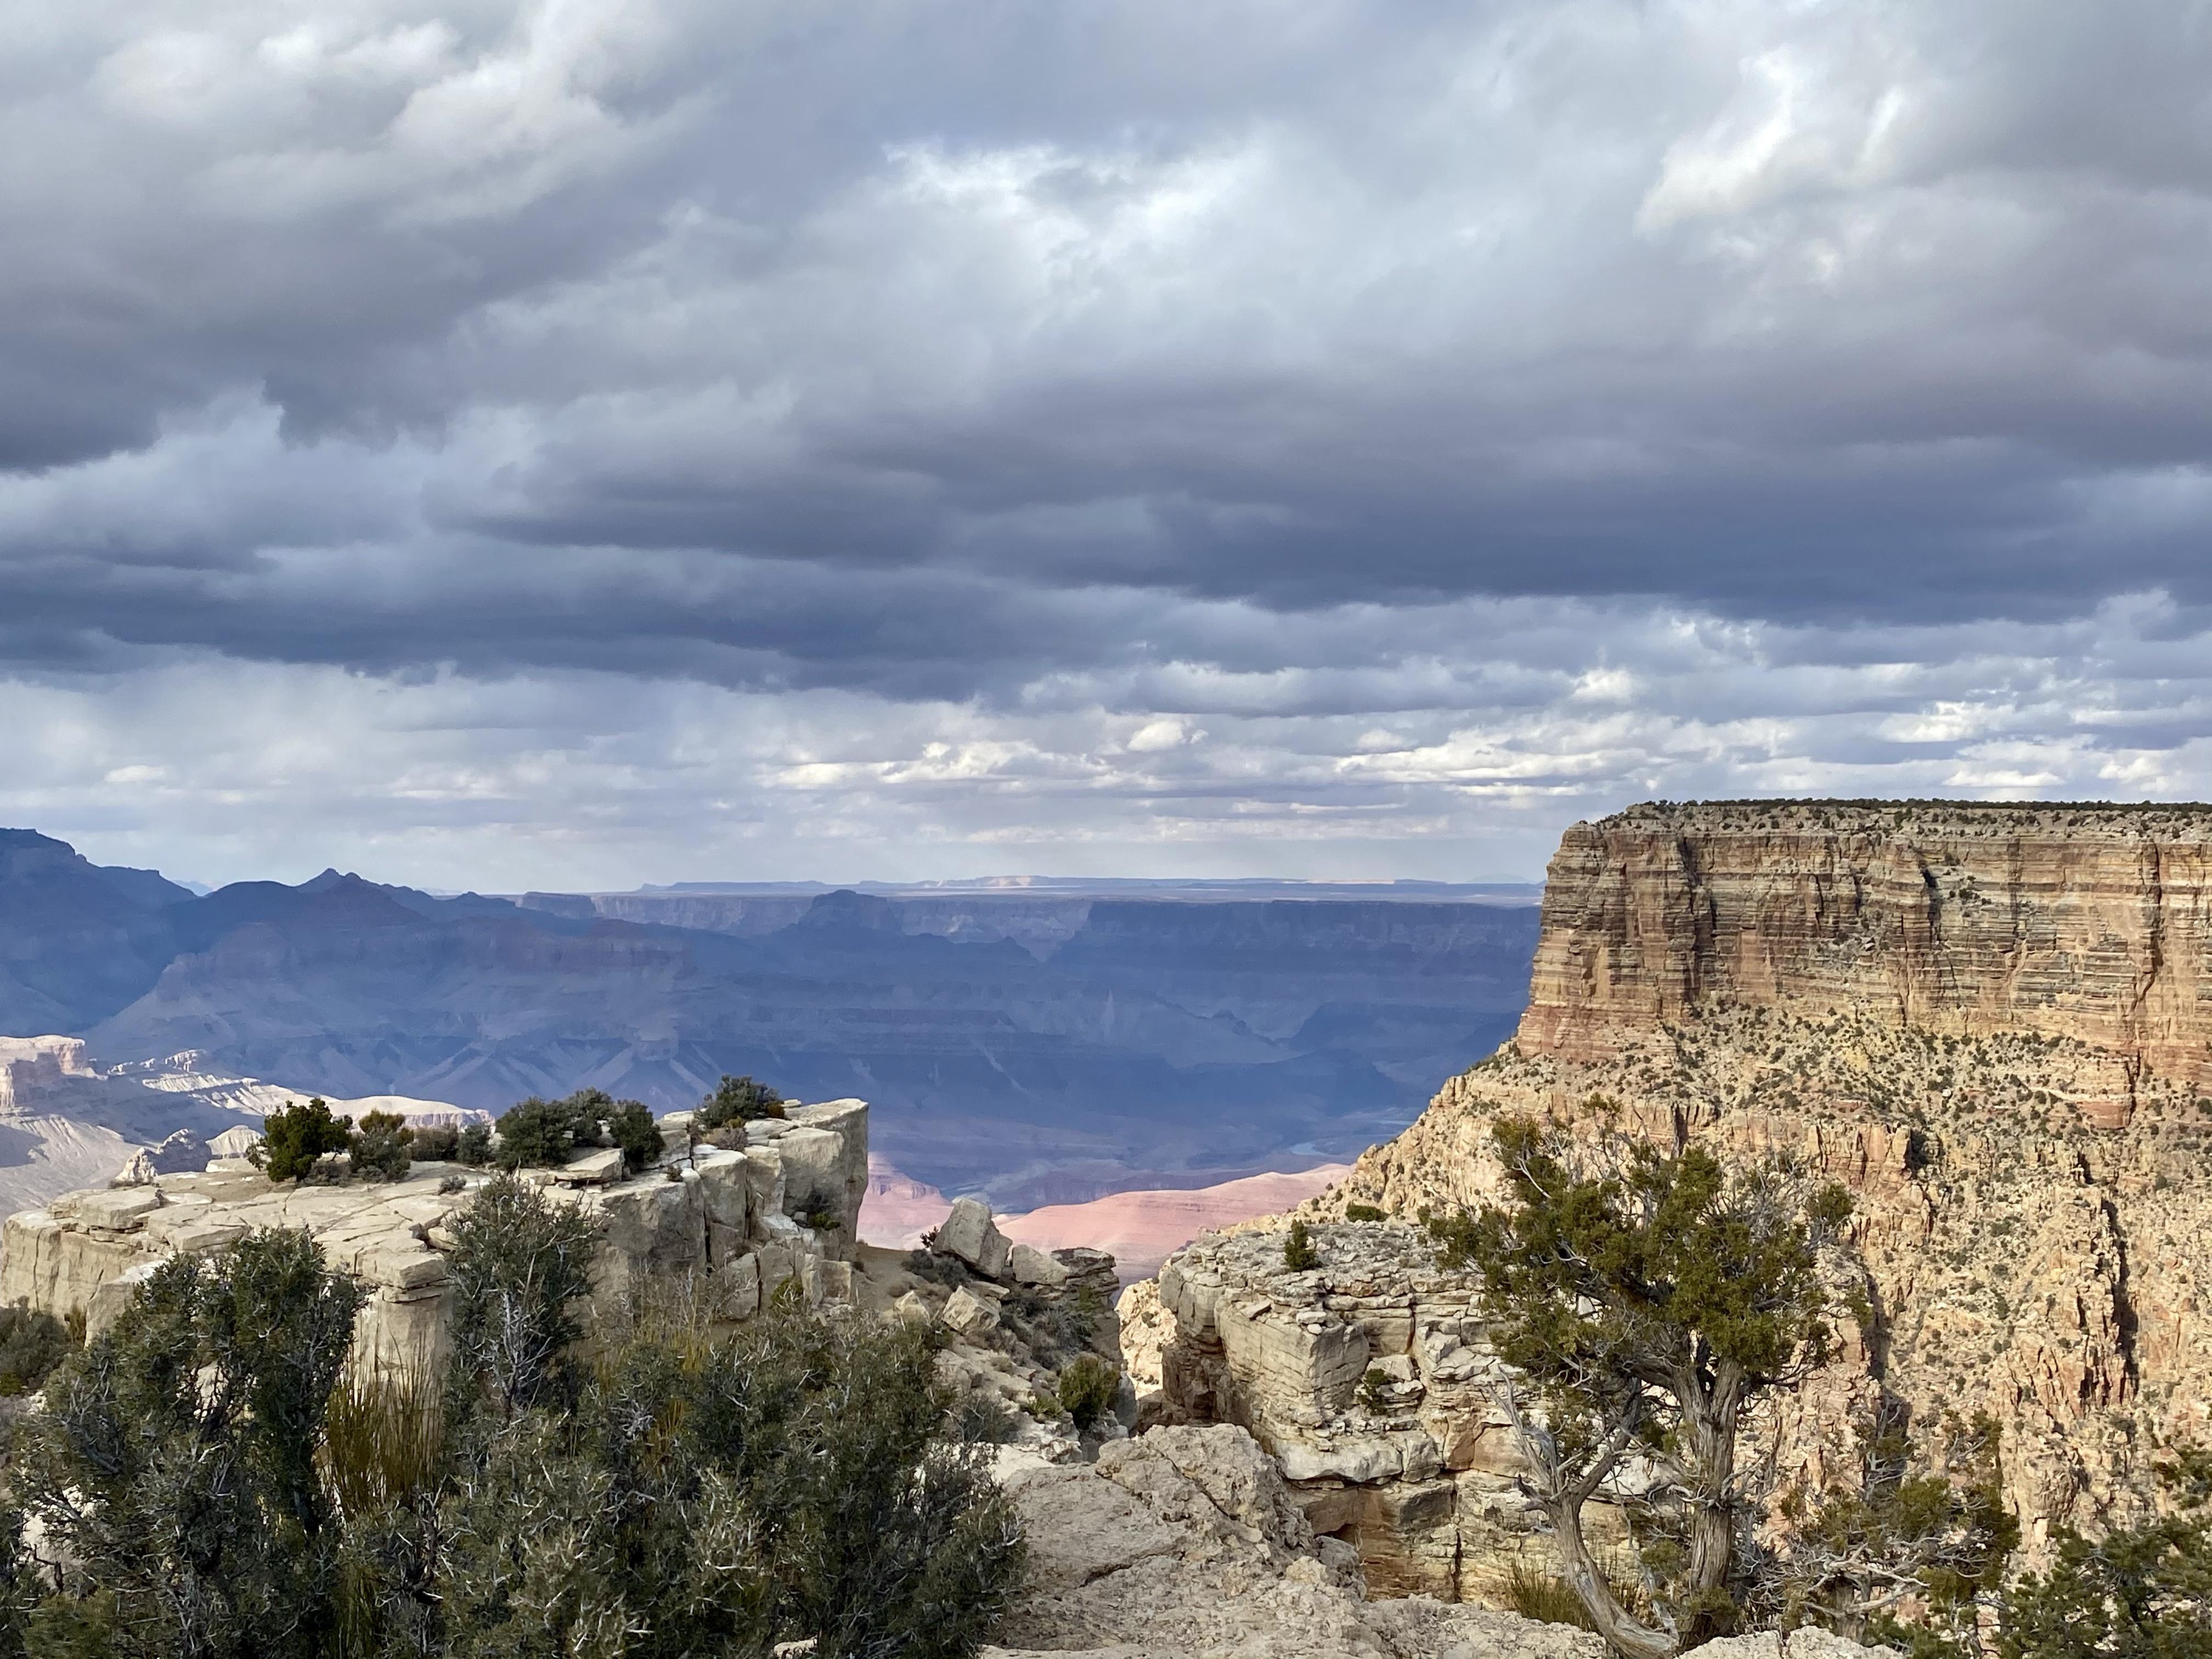 The Grand Canyon South Rim